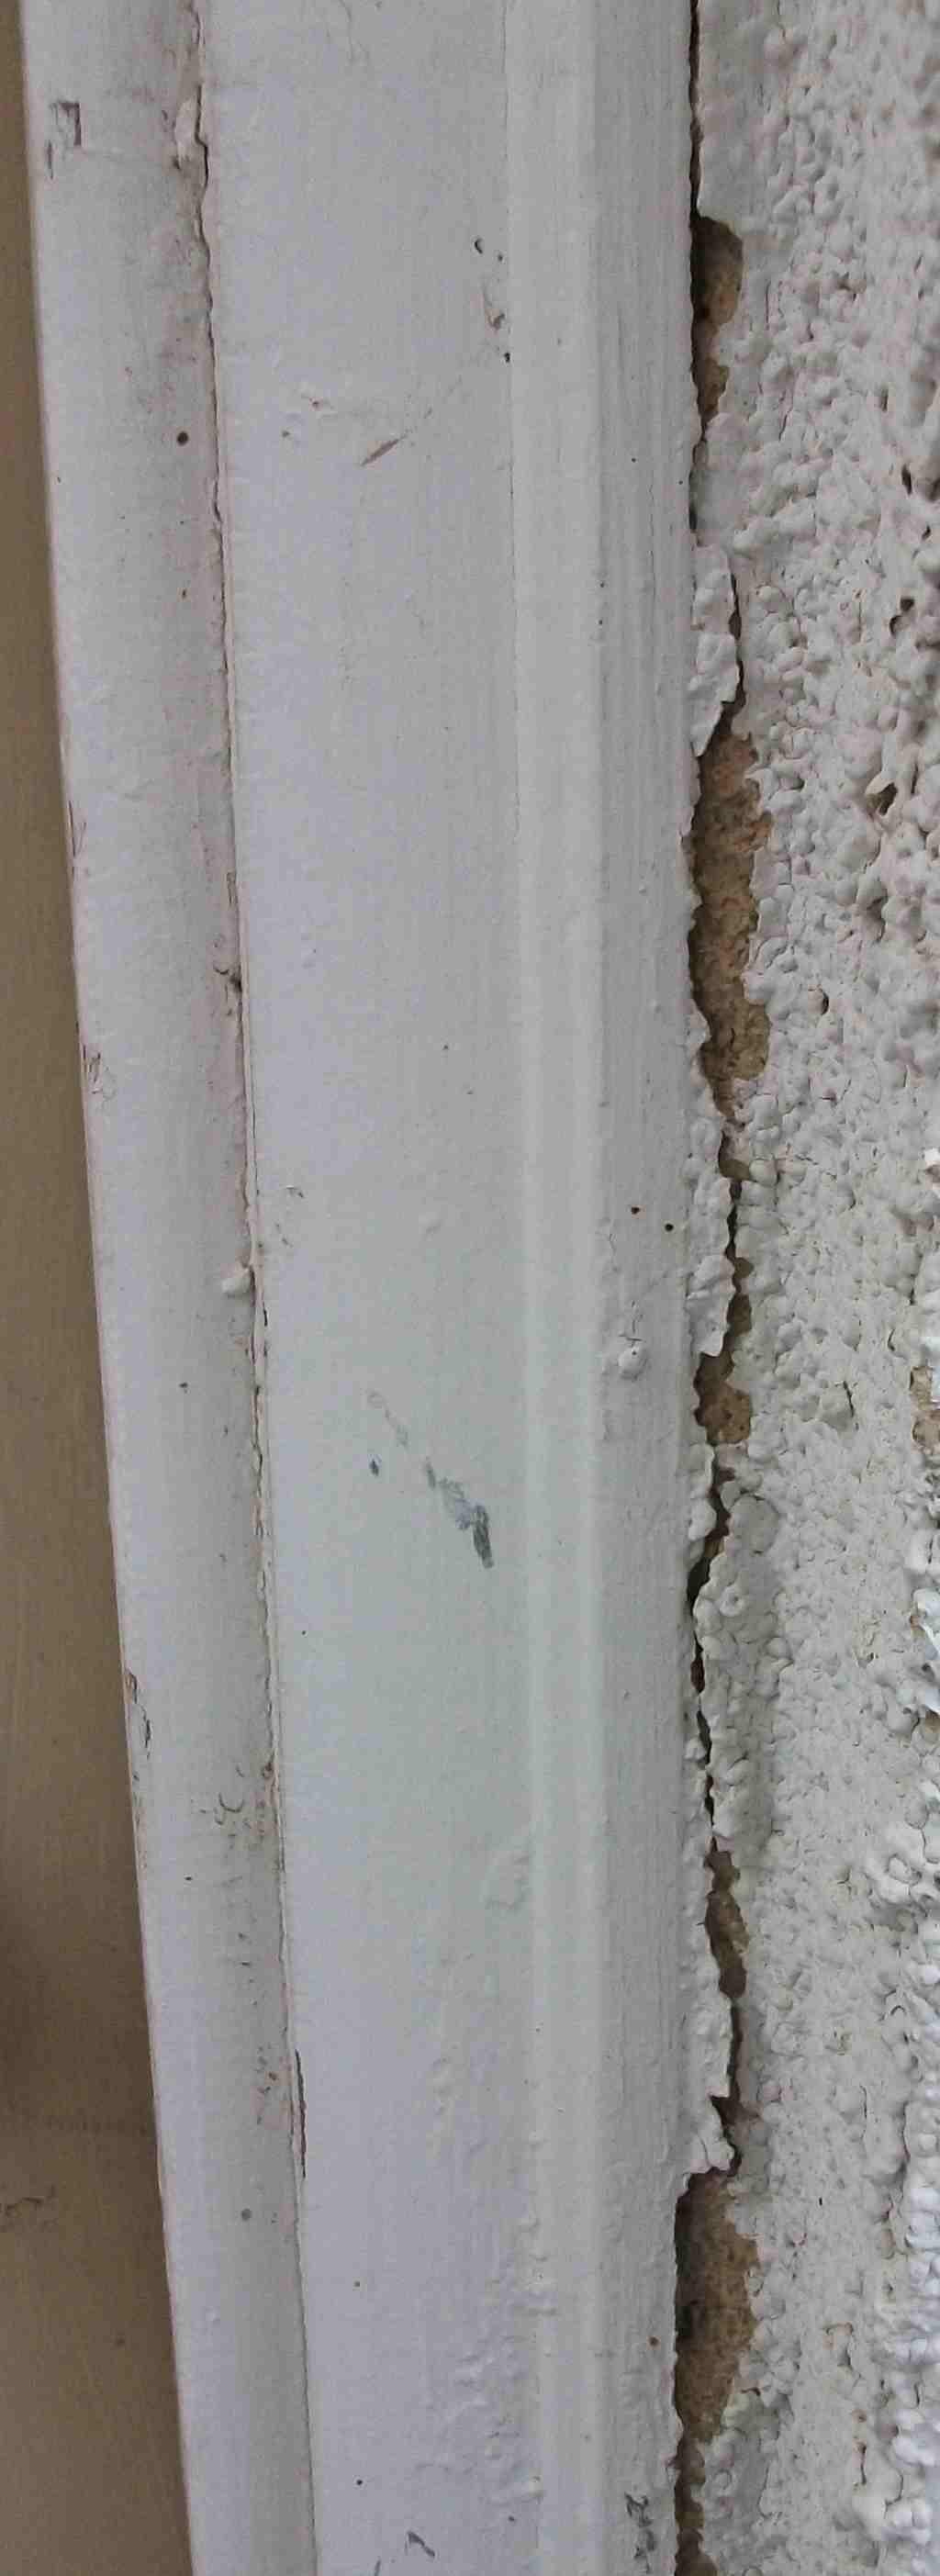 Crack between aluminum window frame and stucco?-doorcrack_sm.jpg